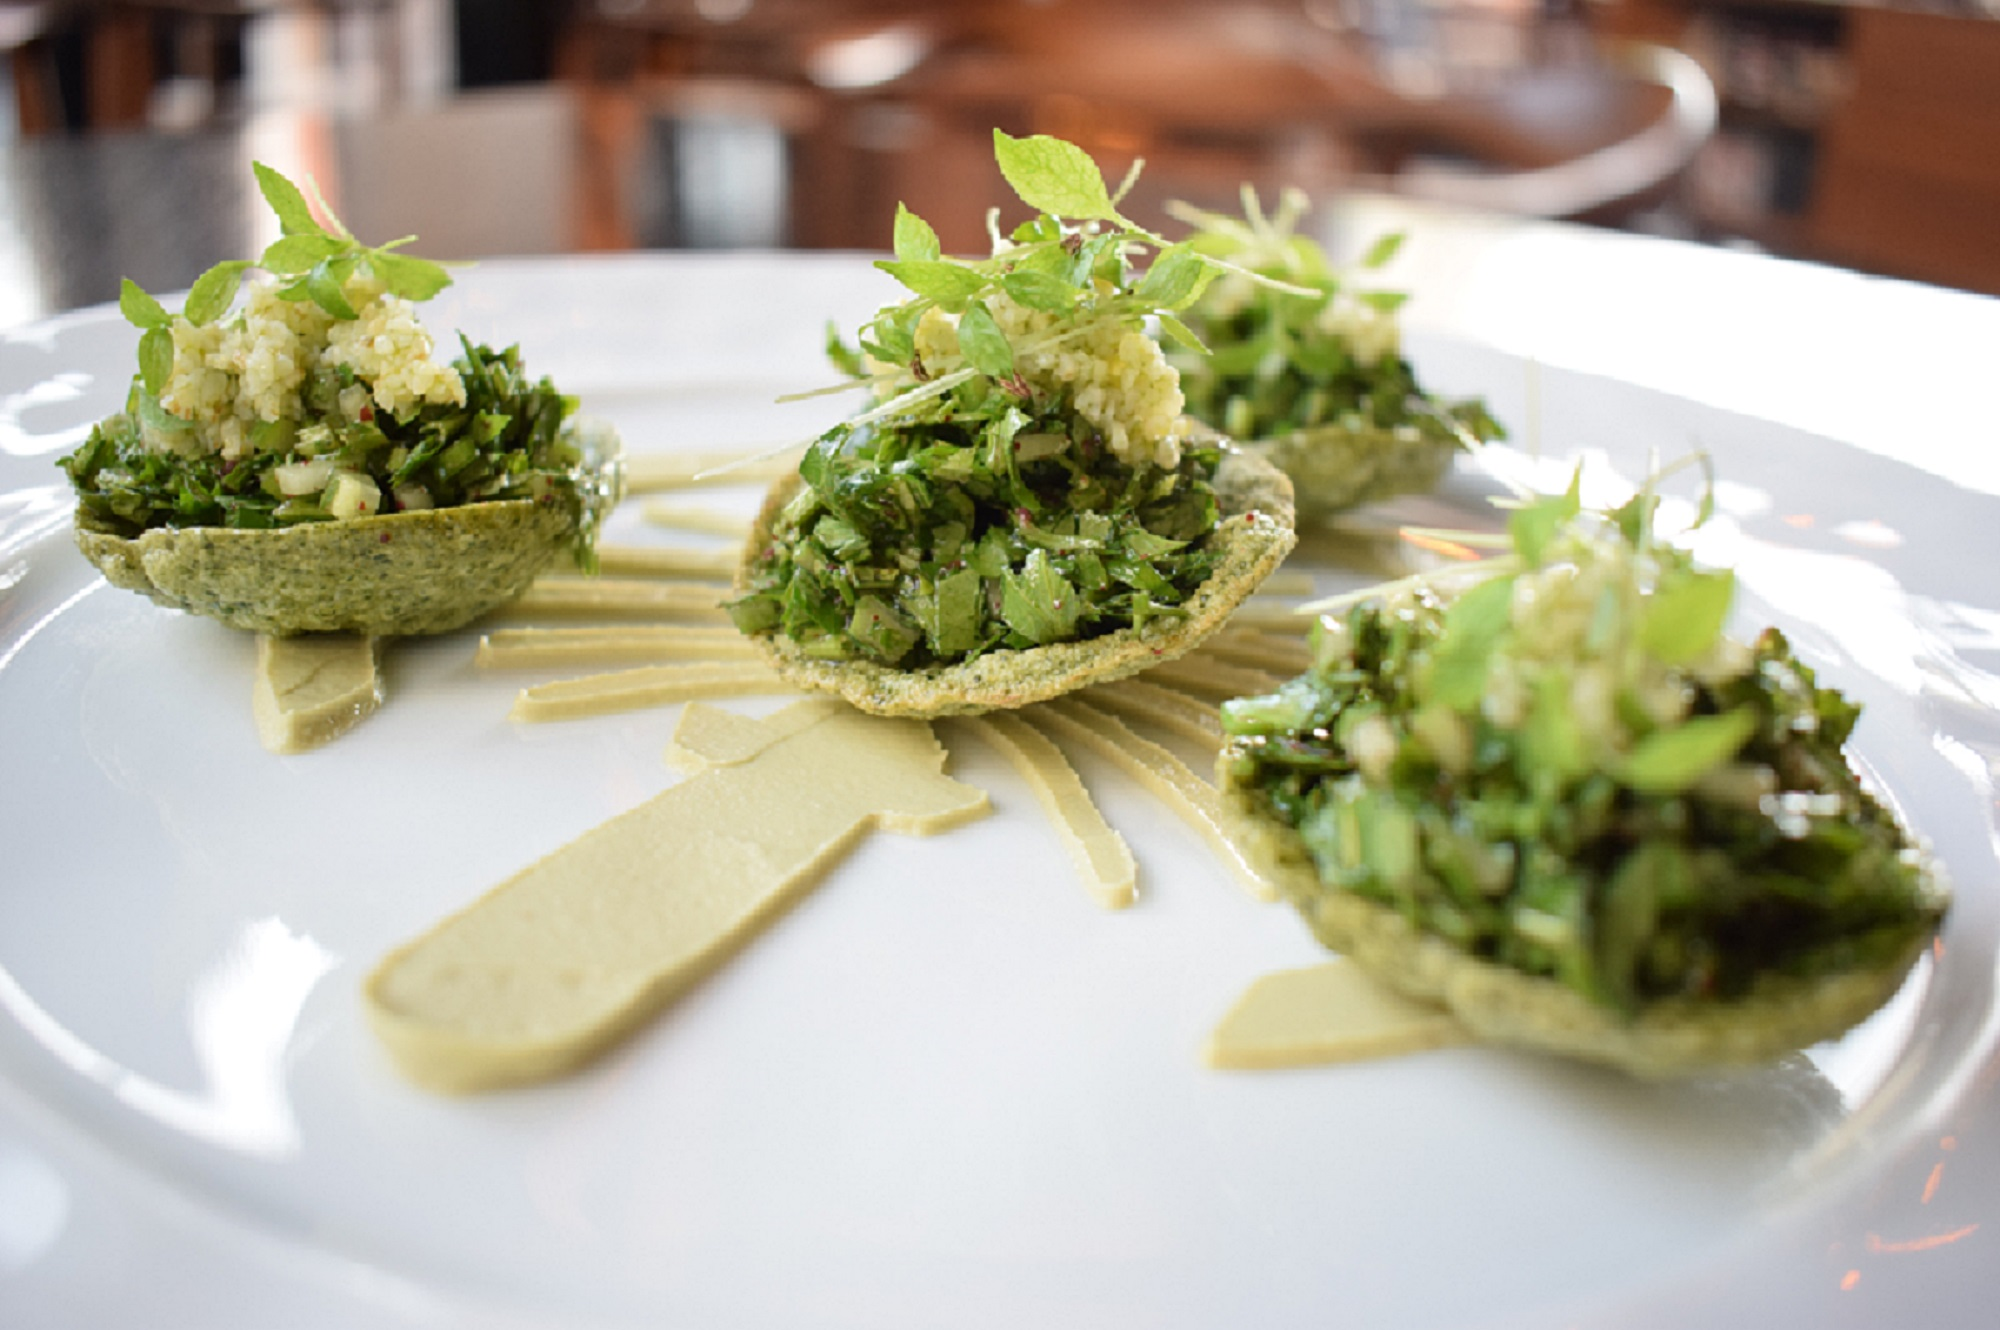 https://i0.wp.com/www.bbcgoodfoodme.com/wp-content/uploads/2020/11/Market-Kitchen-Green-Tabbouleh-Salad.jpg